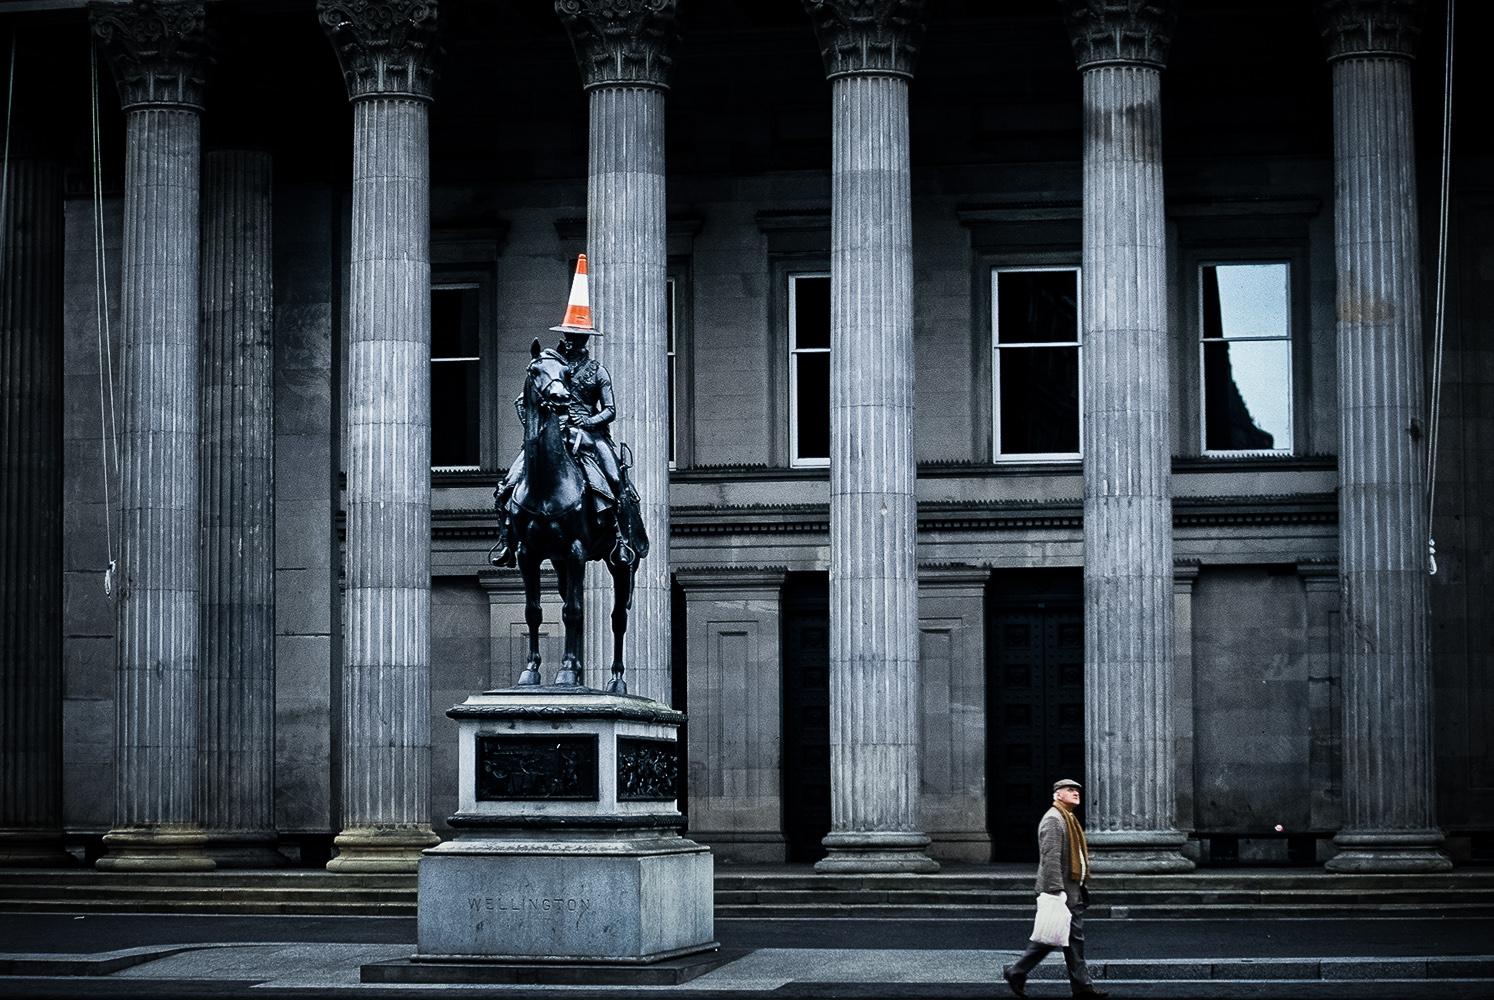 Road-cone-statue-Wellington-photographer-nz.jpg